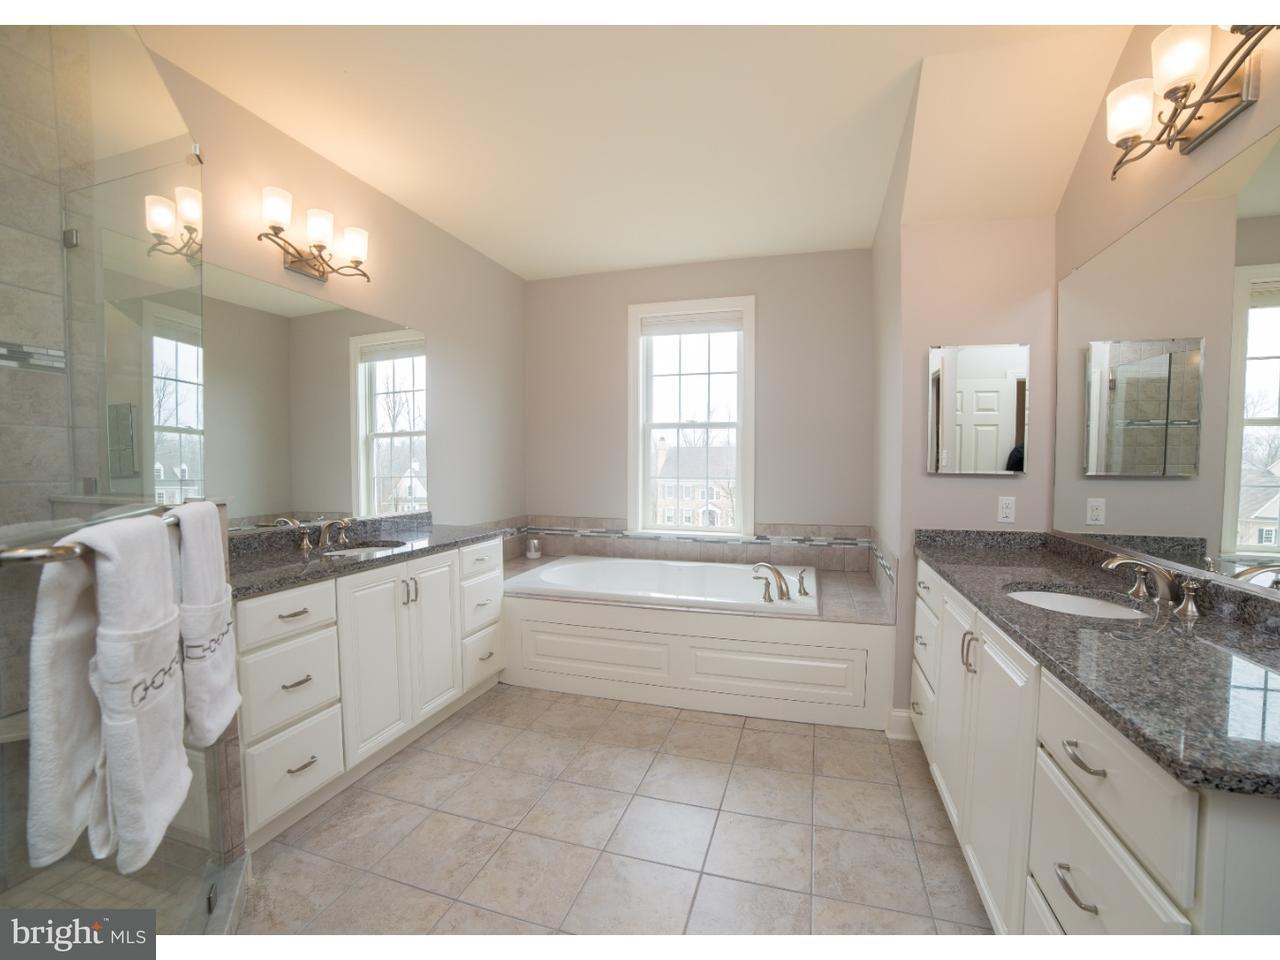 Additional photo for property listing at 125 WAVERLY Circle  Phoenixville, Pennsylvania 19460 Estados Unidos